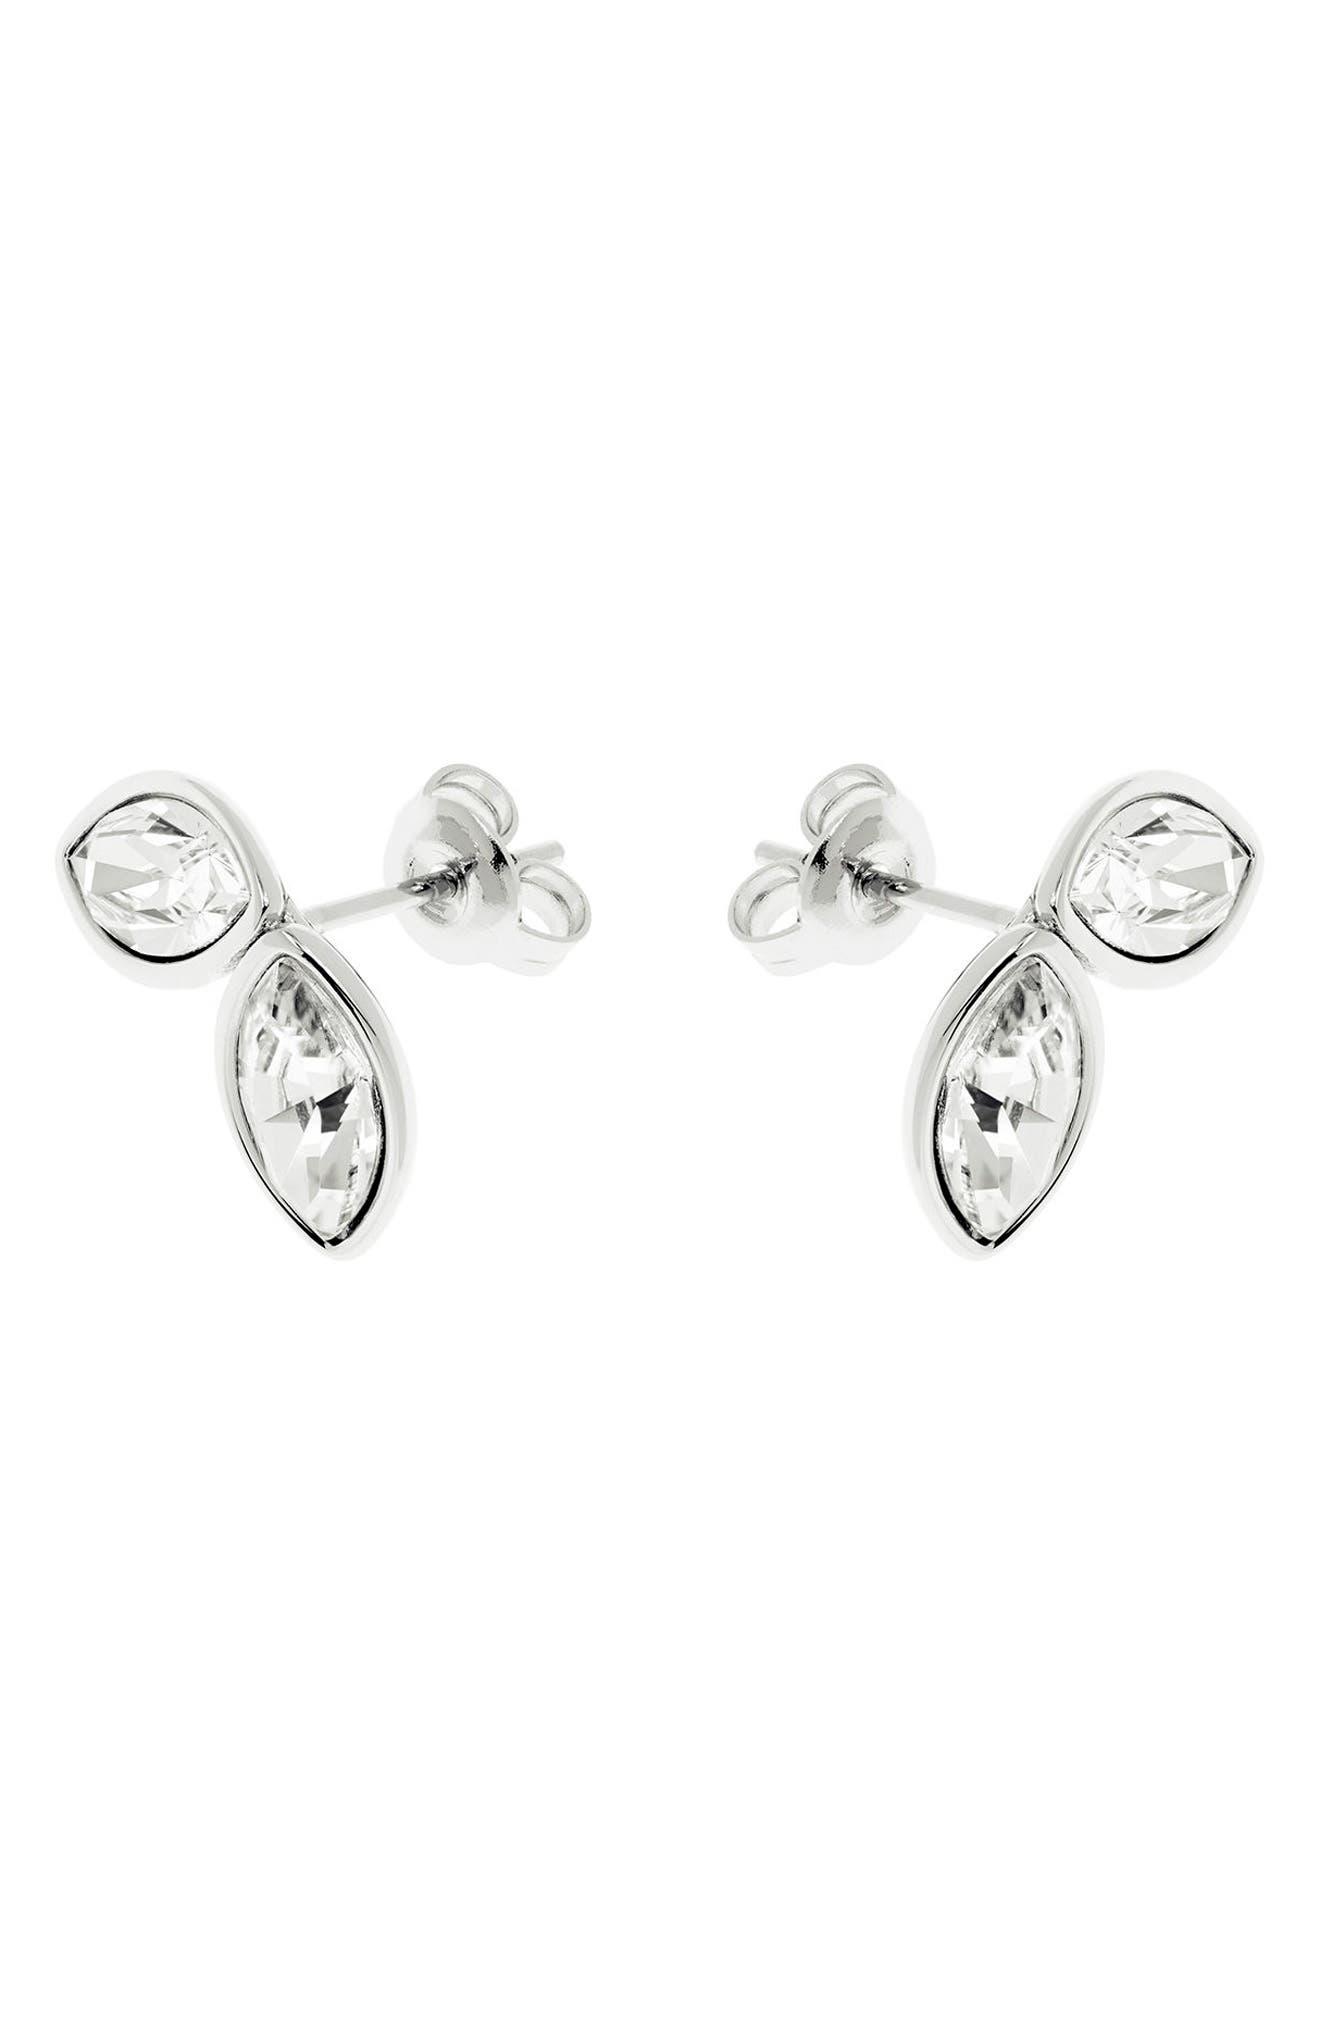 Main Image - Ted Baker London Geometric Bee Stud Earrings